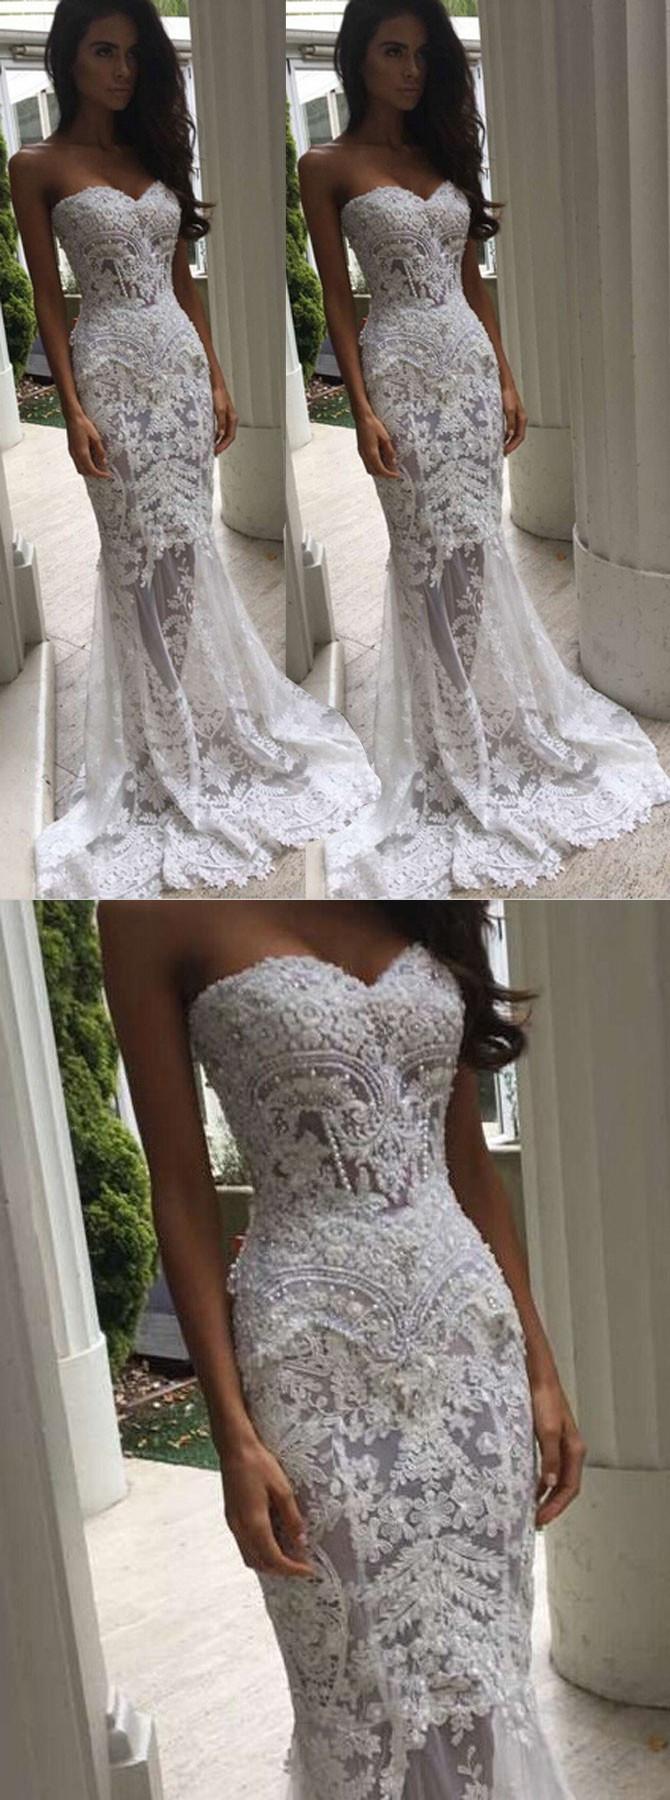 white wedding dresses,lace wedding dresses,mermaid wedding dresses ...